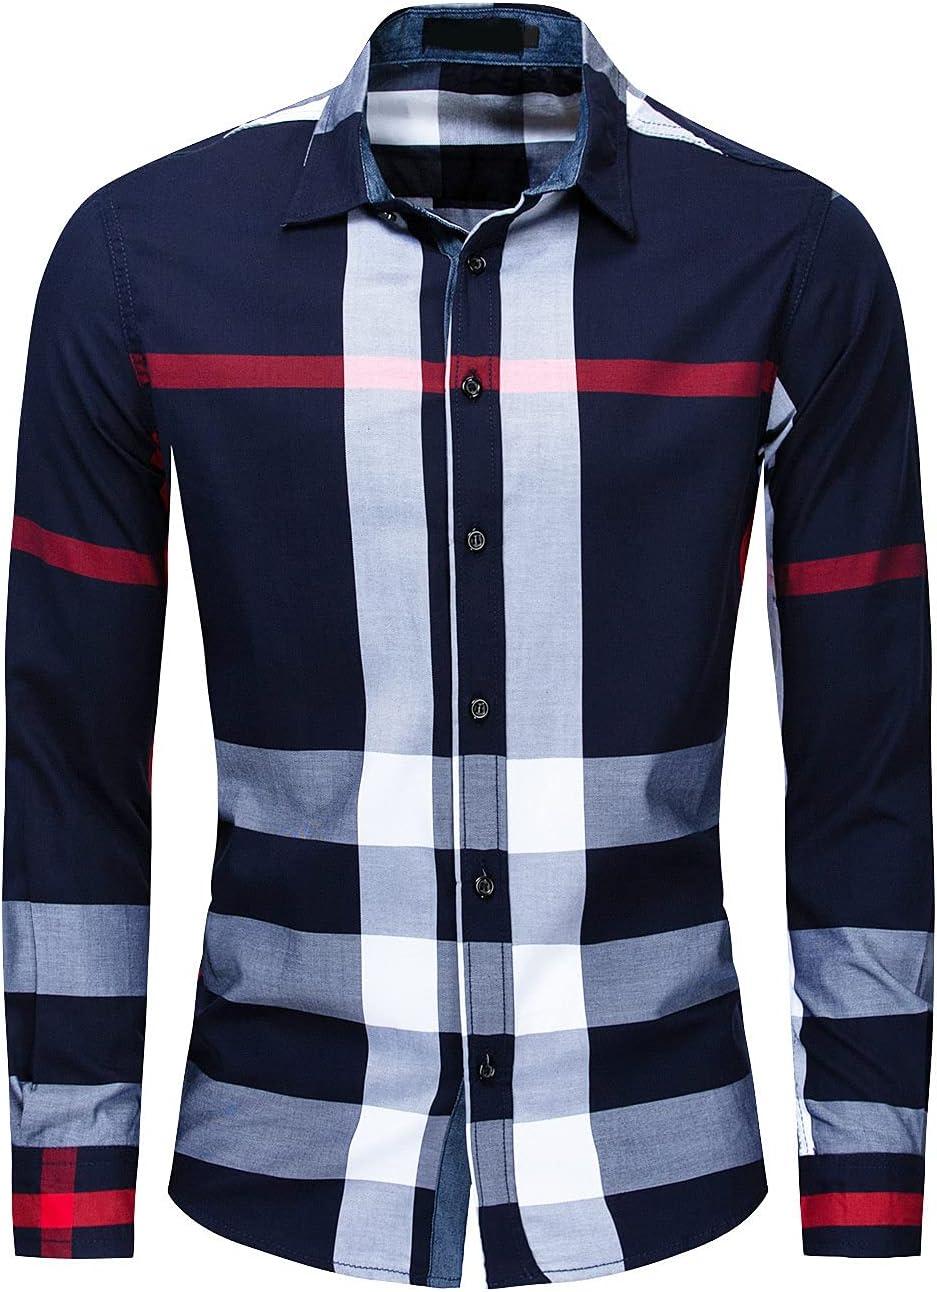 Men's Regular Fit Collared Plaid Shirts Cotton Long Sleeve Button Down Dress Shirt Casual Slim Business Plaids Shirt (Blue,XX-Large)